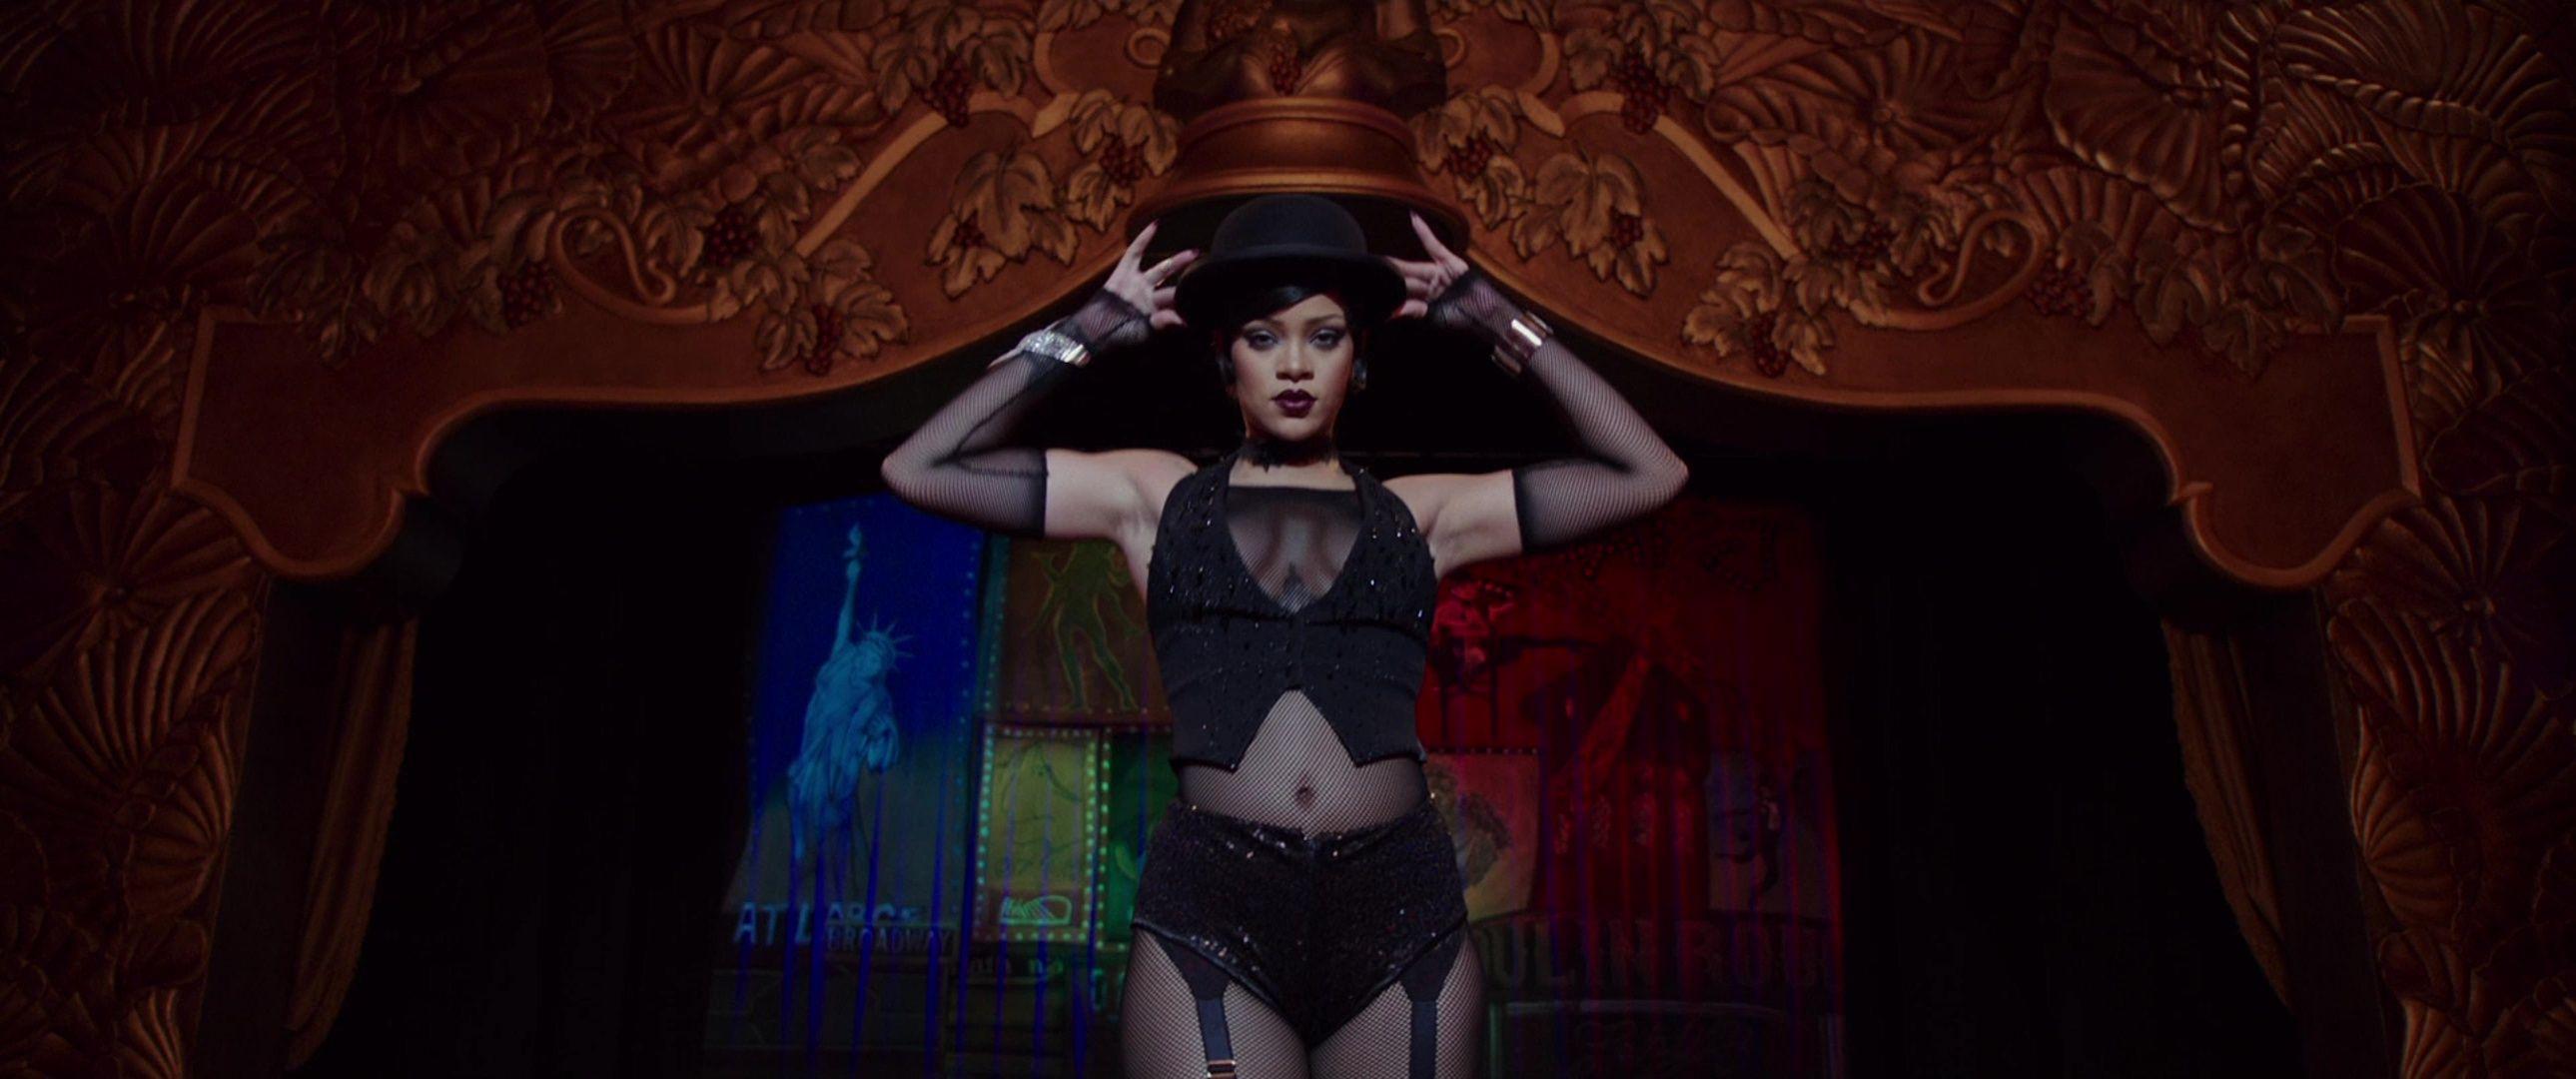 Rihanna-Sexy-11-thefappeningblog.com_.jpg